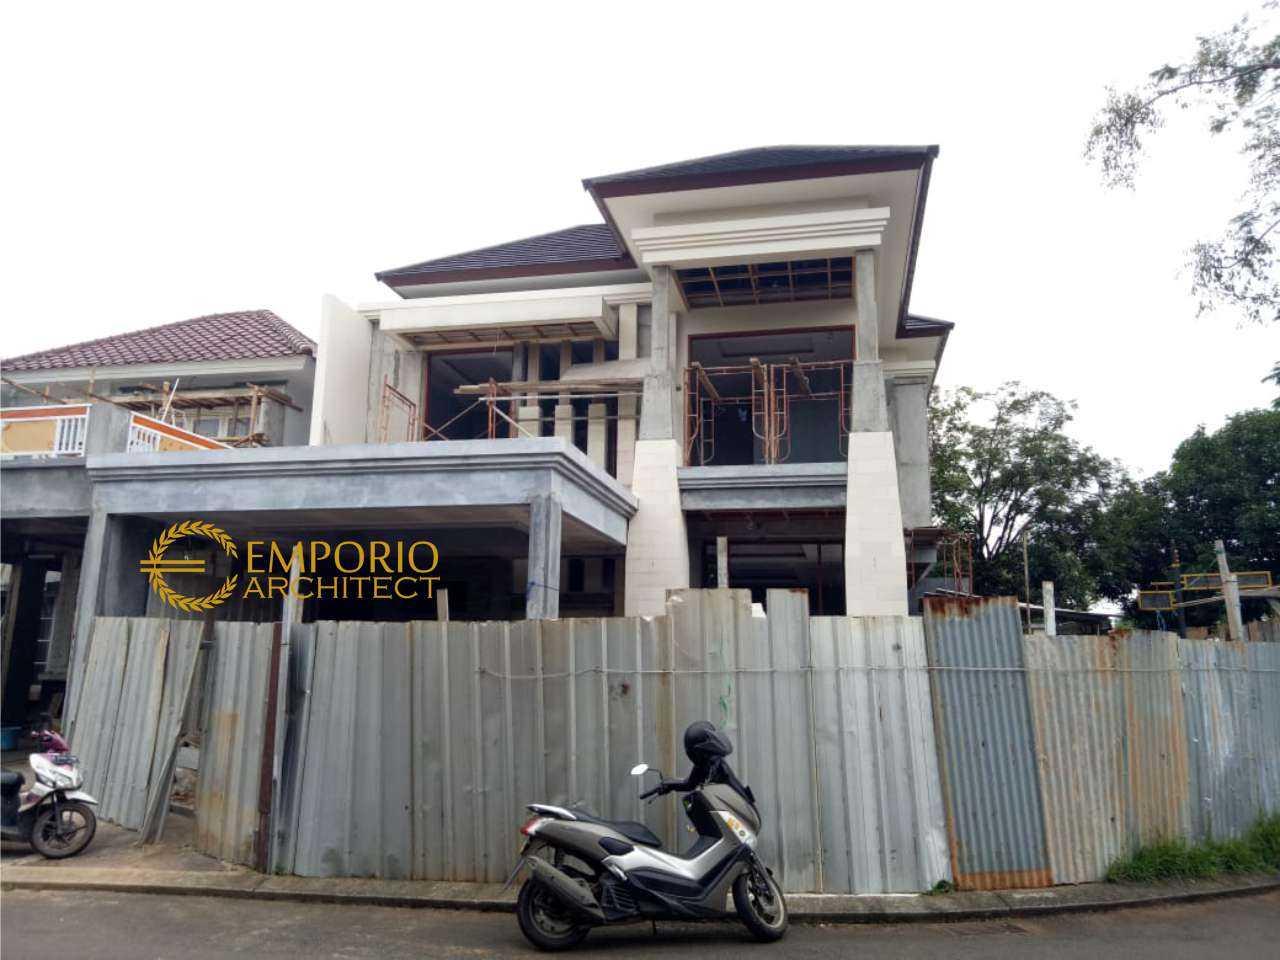 Emporio Architect Jasa Arsitek Cibubur Progress Pembangunan Rumah Villa Bali Tropis 262 @ Cibubur Cibubur, Kec. Ciracas, Kota Jakarta Timur, Daerah Khusus Ibukota Jakarta, Indonesia Cibubur, Kec. Ciracas, Kota Jakarta Timur, Daerah Khusus Ibukota Jakarta, Indonesia Emporio-Architect-Jasa-Arsitek-Cibubur-Progress-Pembangunan-Rumah-Villa-Bali-Tropis-262-Cibubur  87579